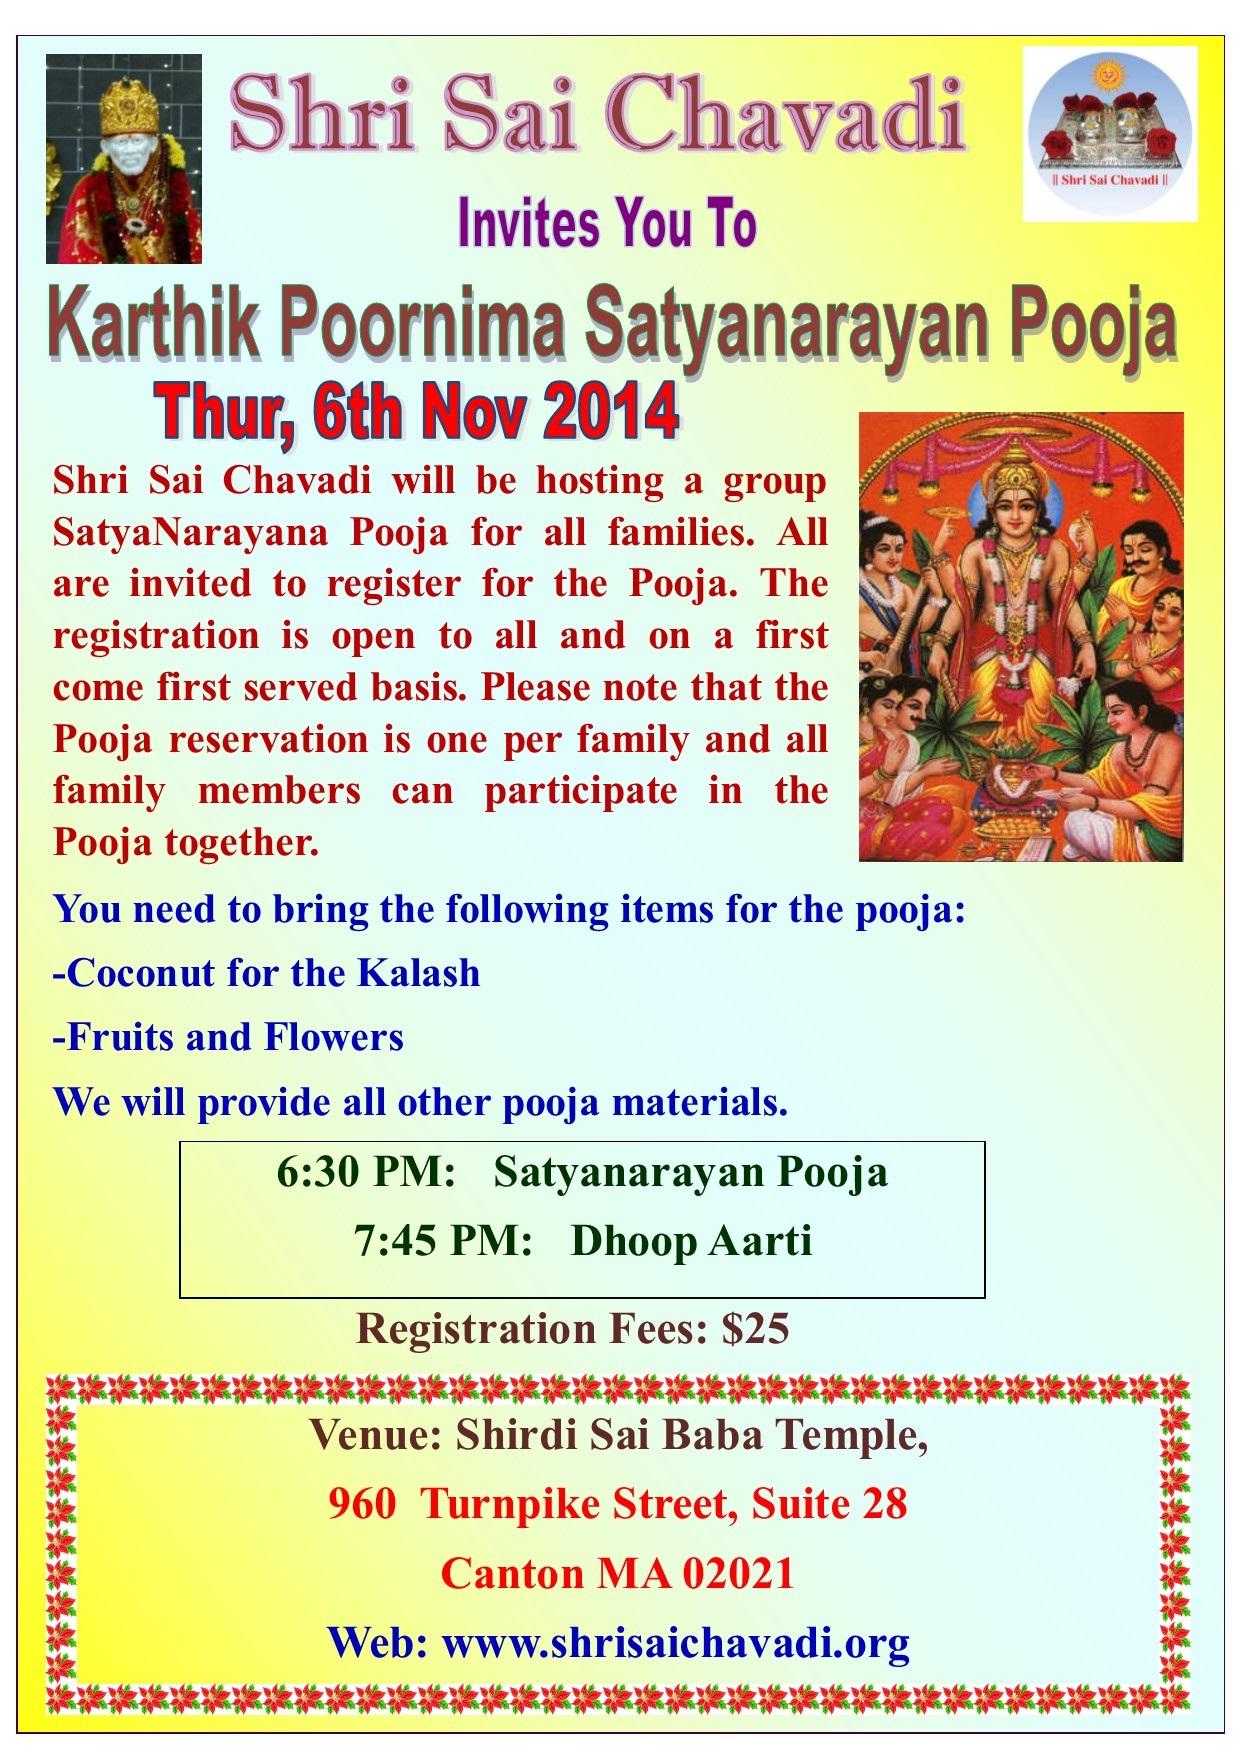 Invitation For Satyanarayan Pooja - Premium Invitation ...